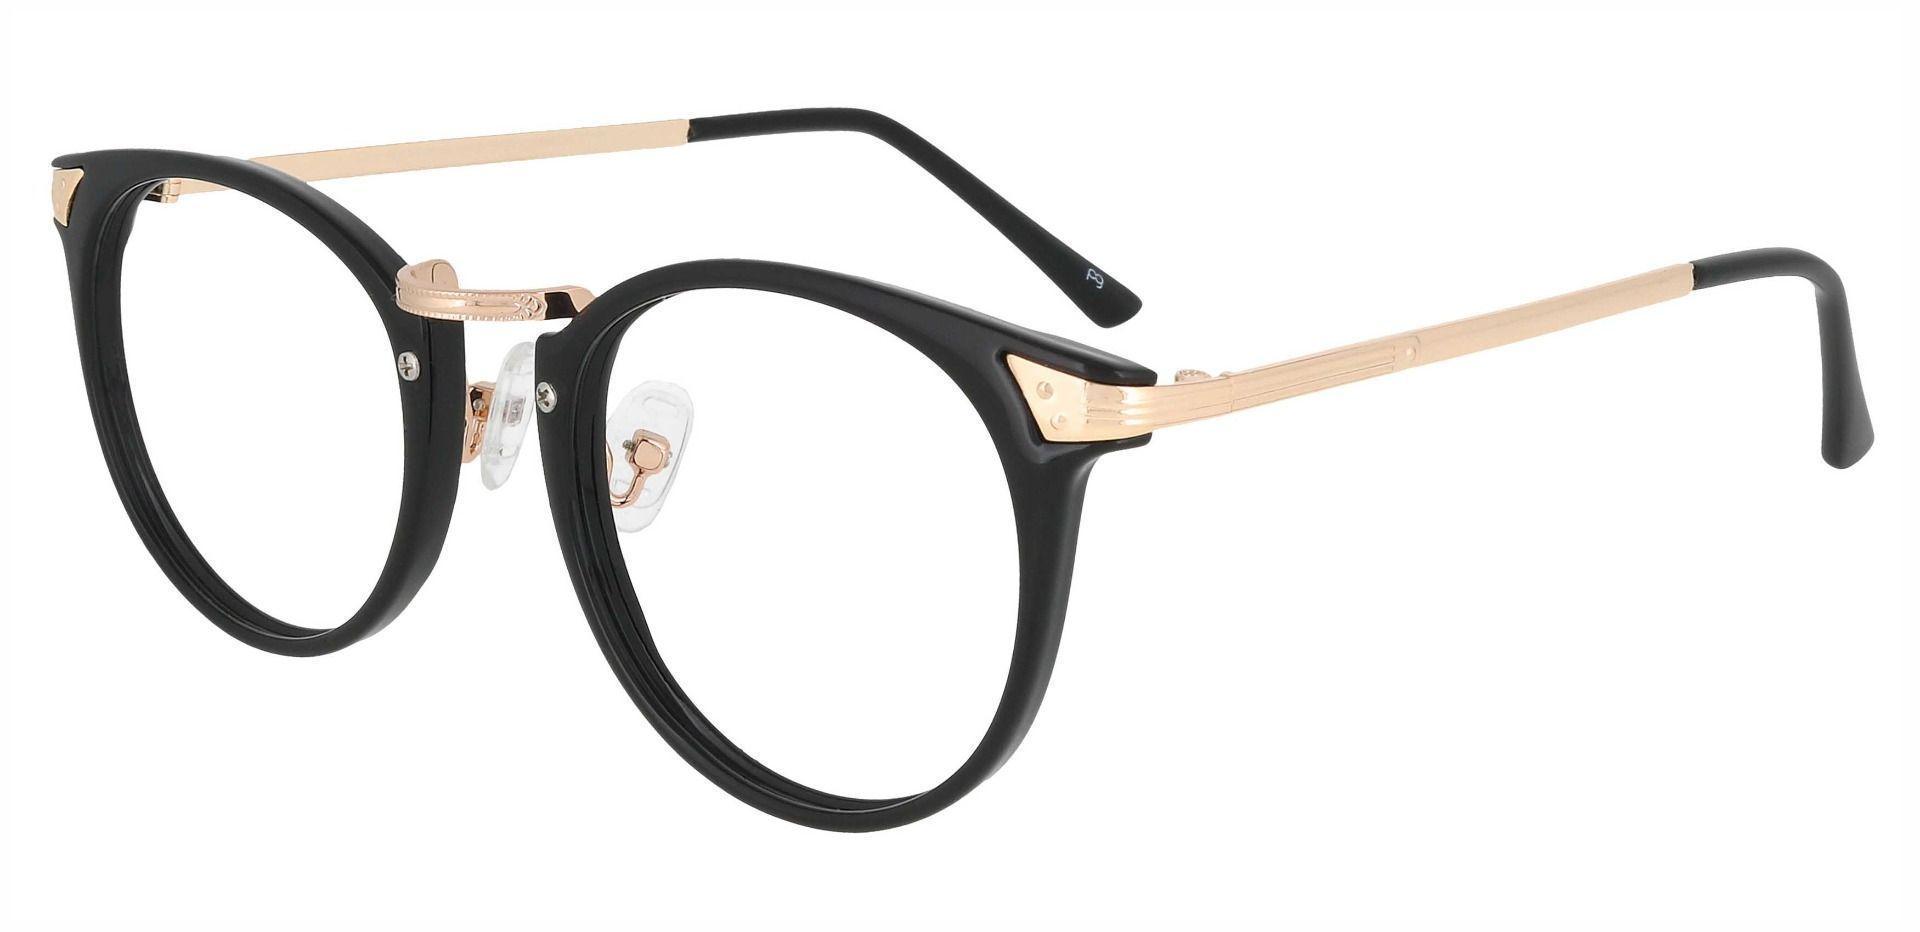 Blackwell Round Prescription Glasses - Black